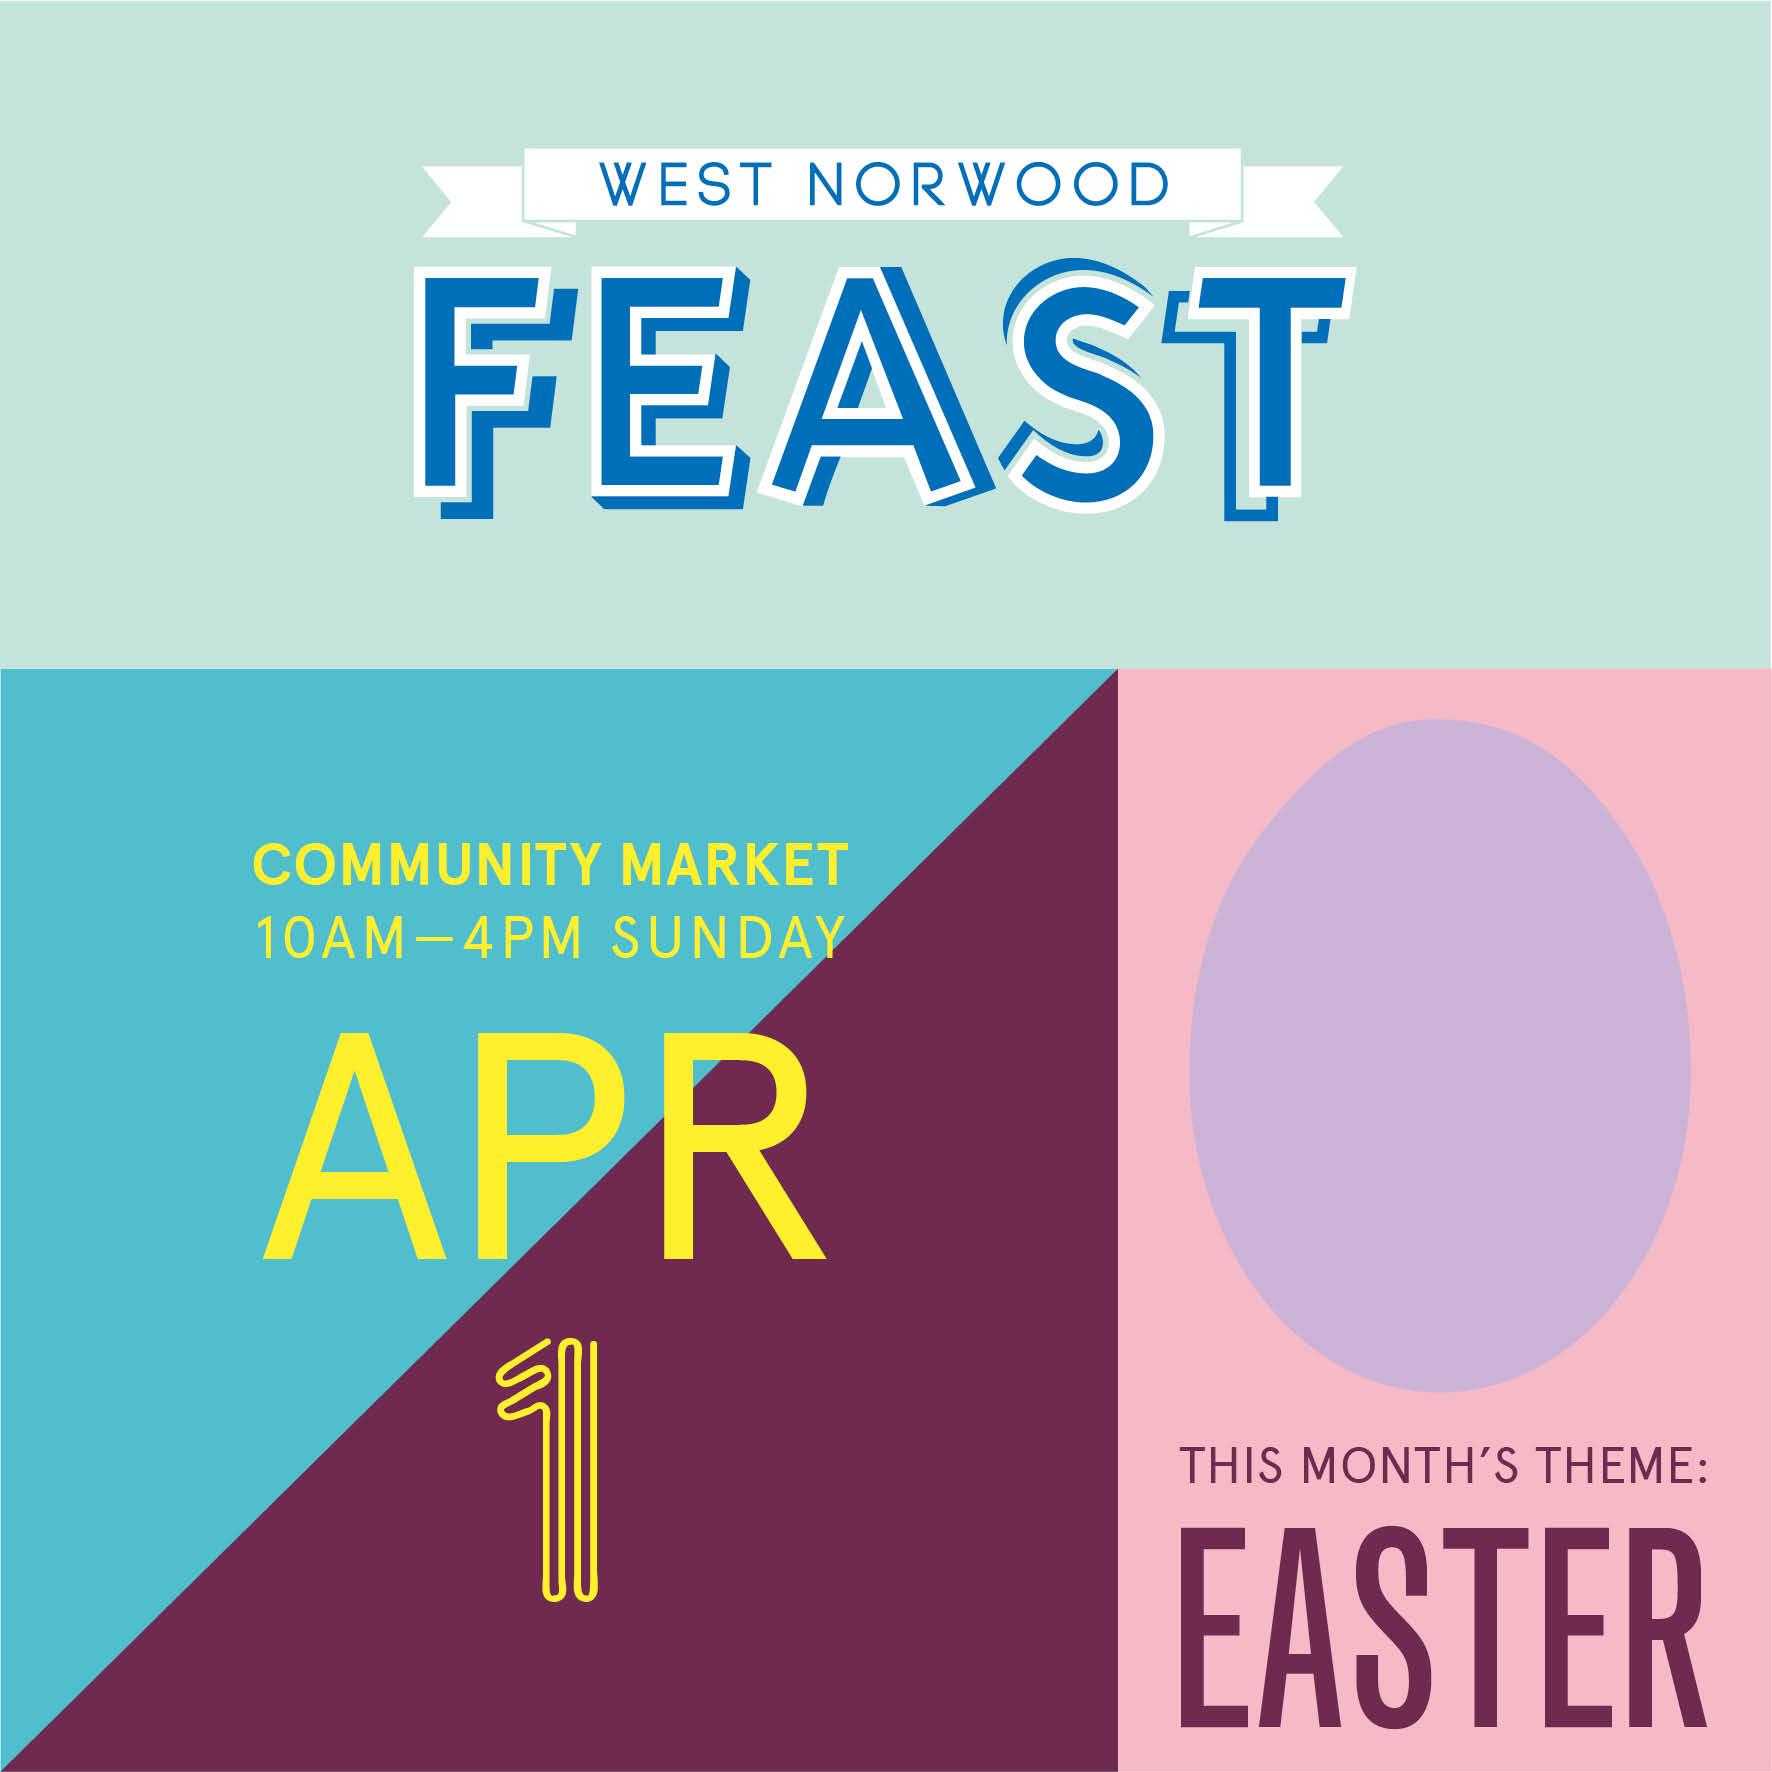 West Norwood FEAST design by Park Studio